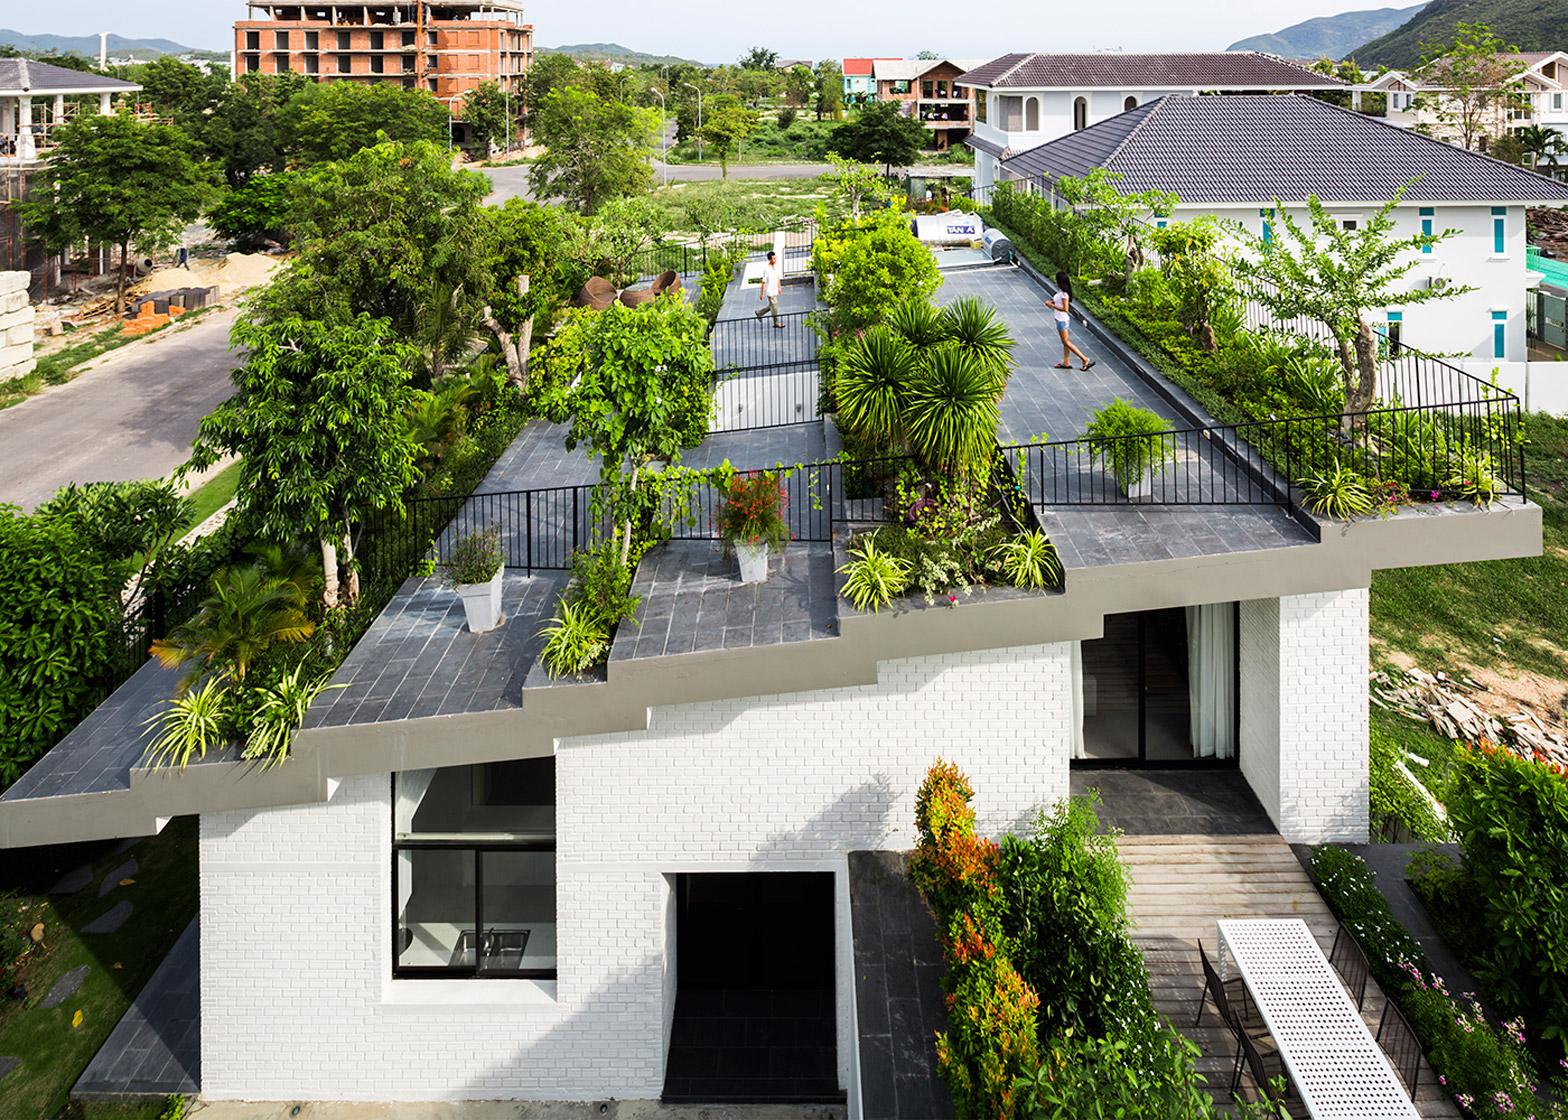 Superbe 10 Of 10; House In Nha Trang By Vo Trang Nghia And Masaaki Iwamoto